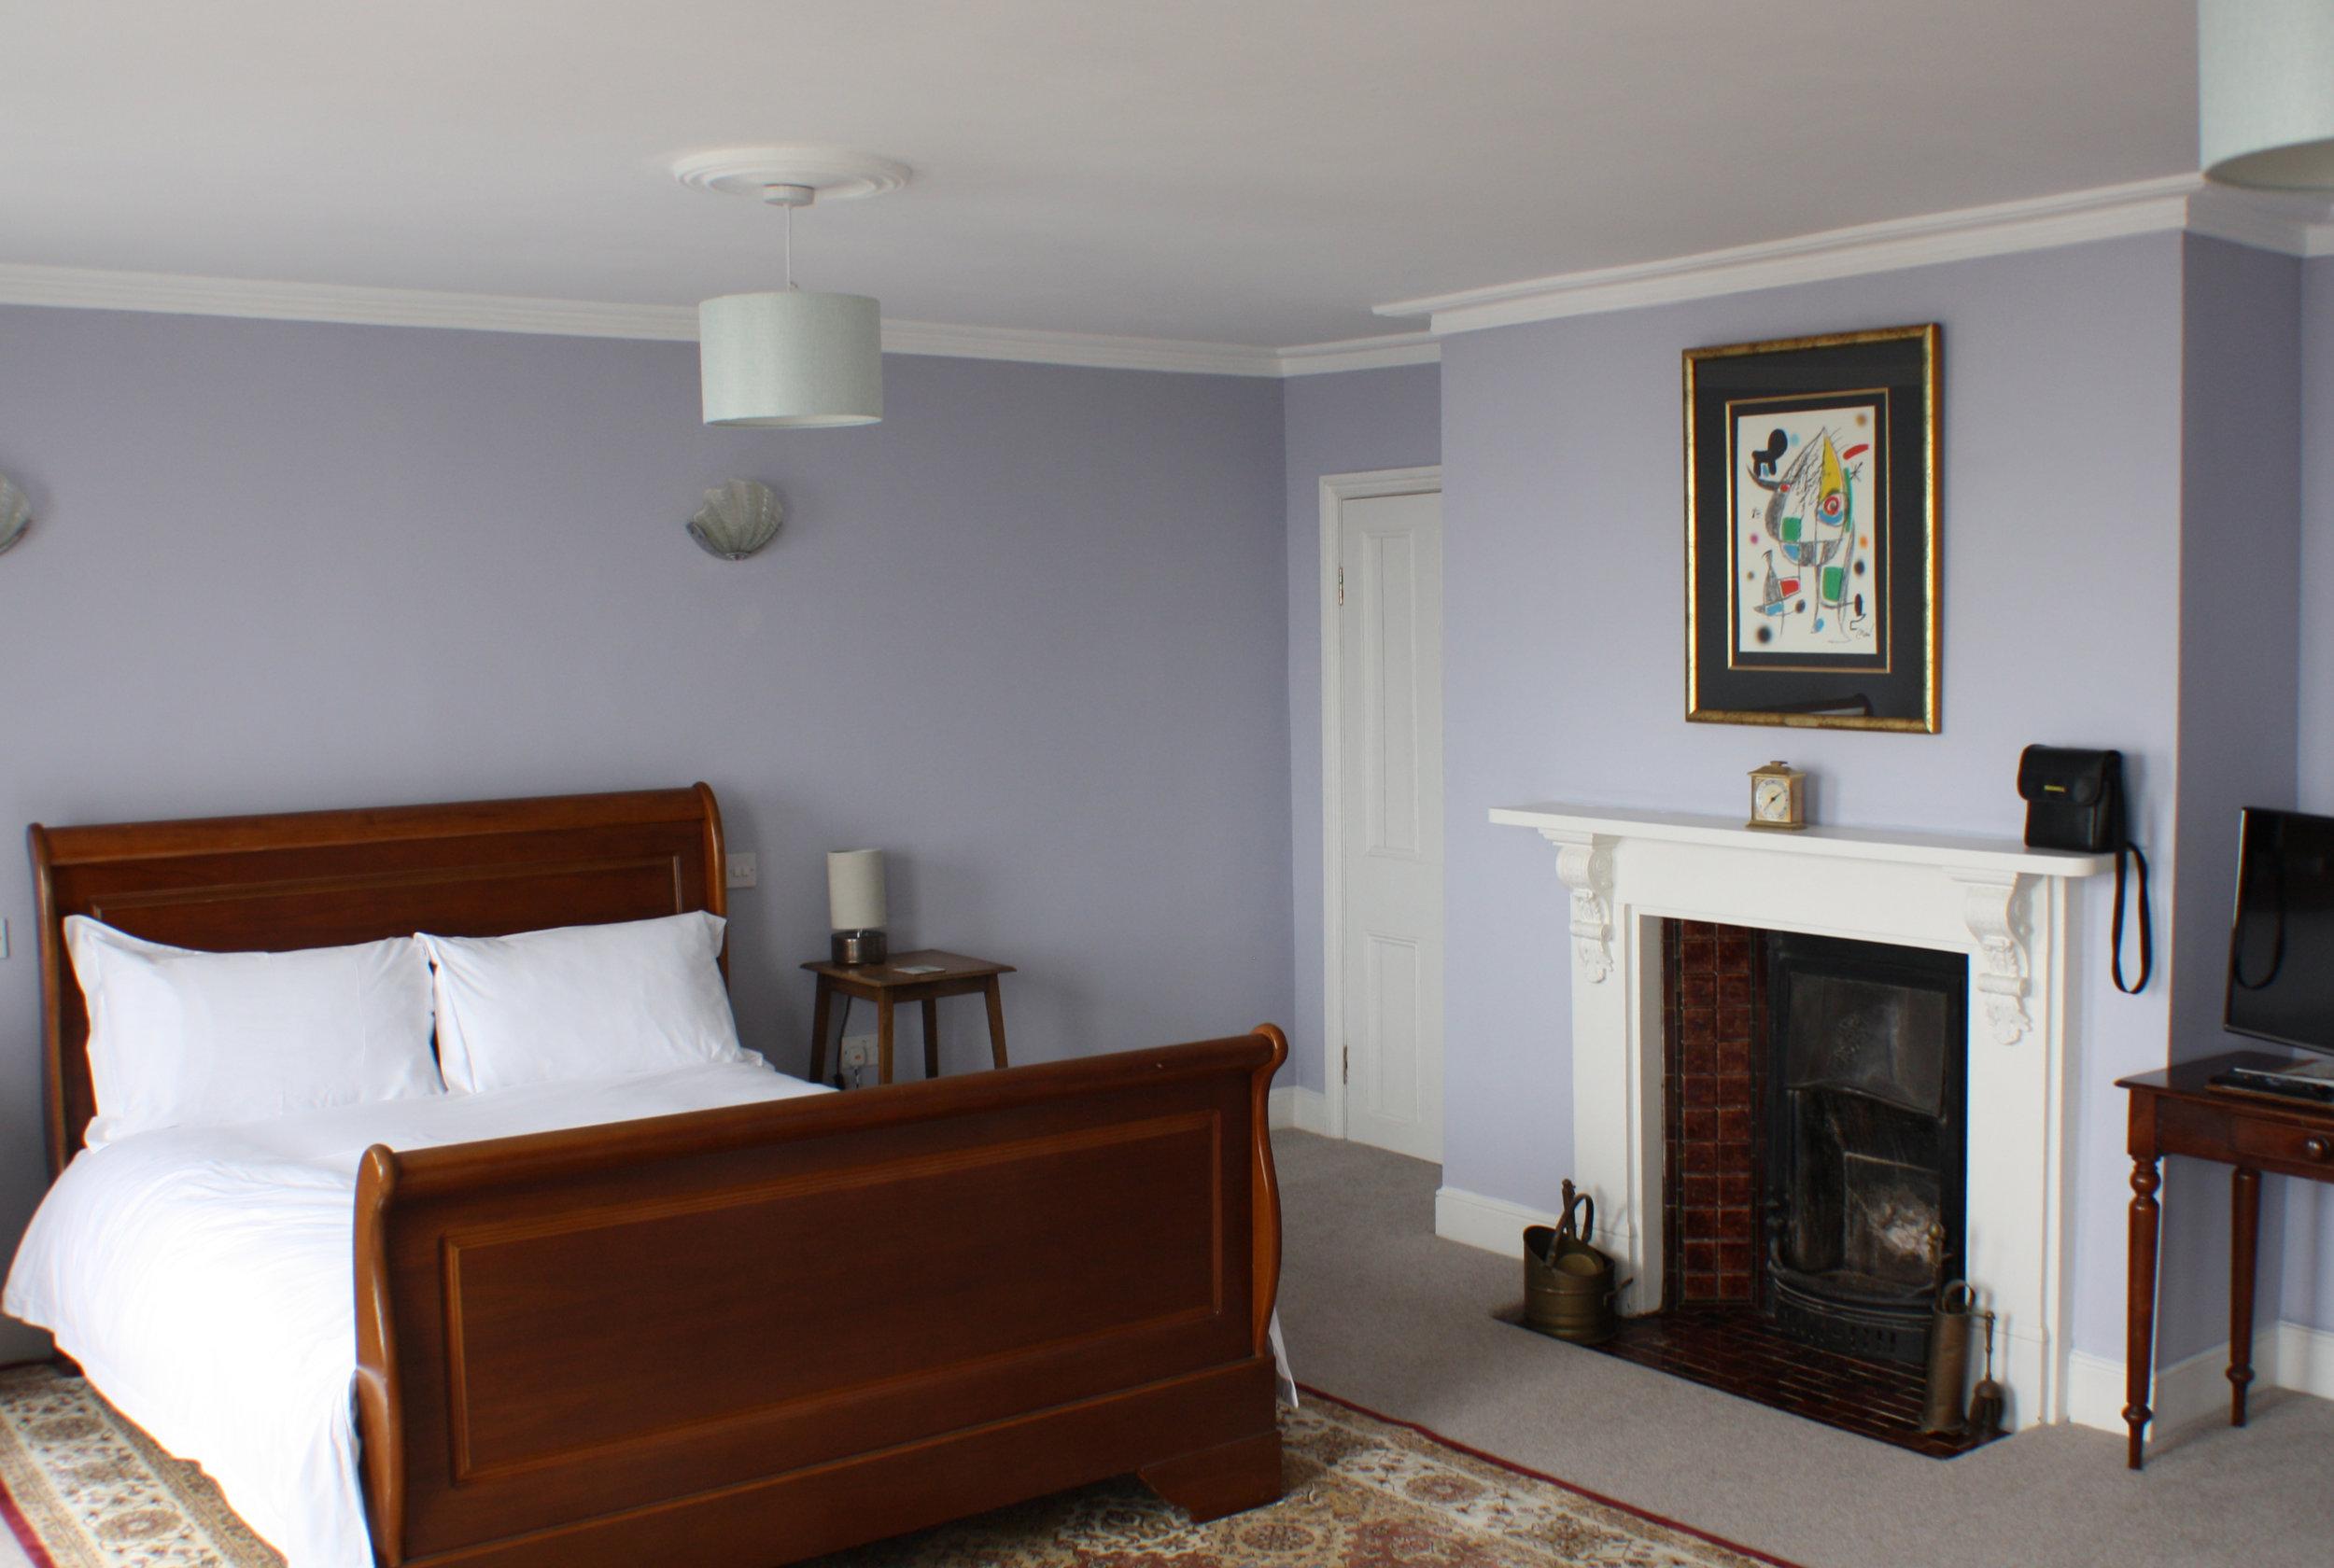 Mater Bedroom 9 Nelson Crescent